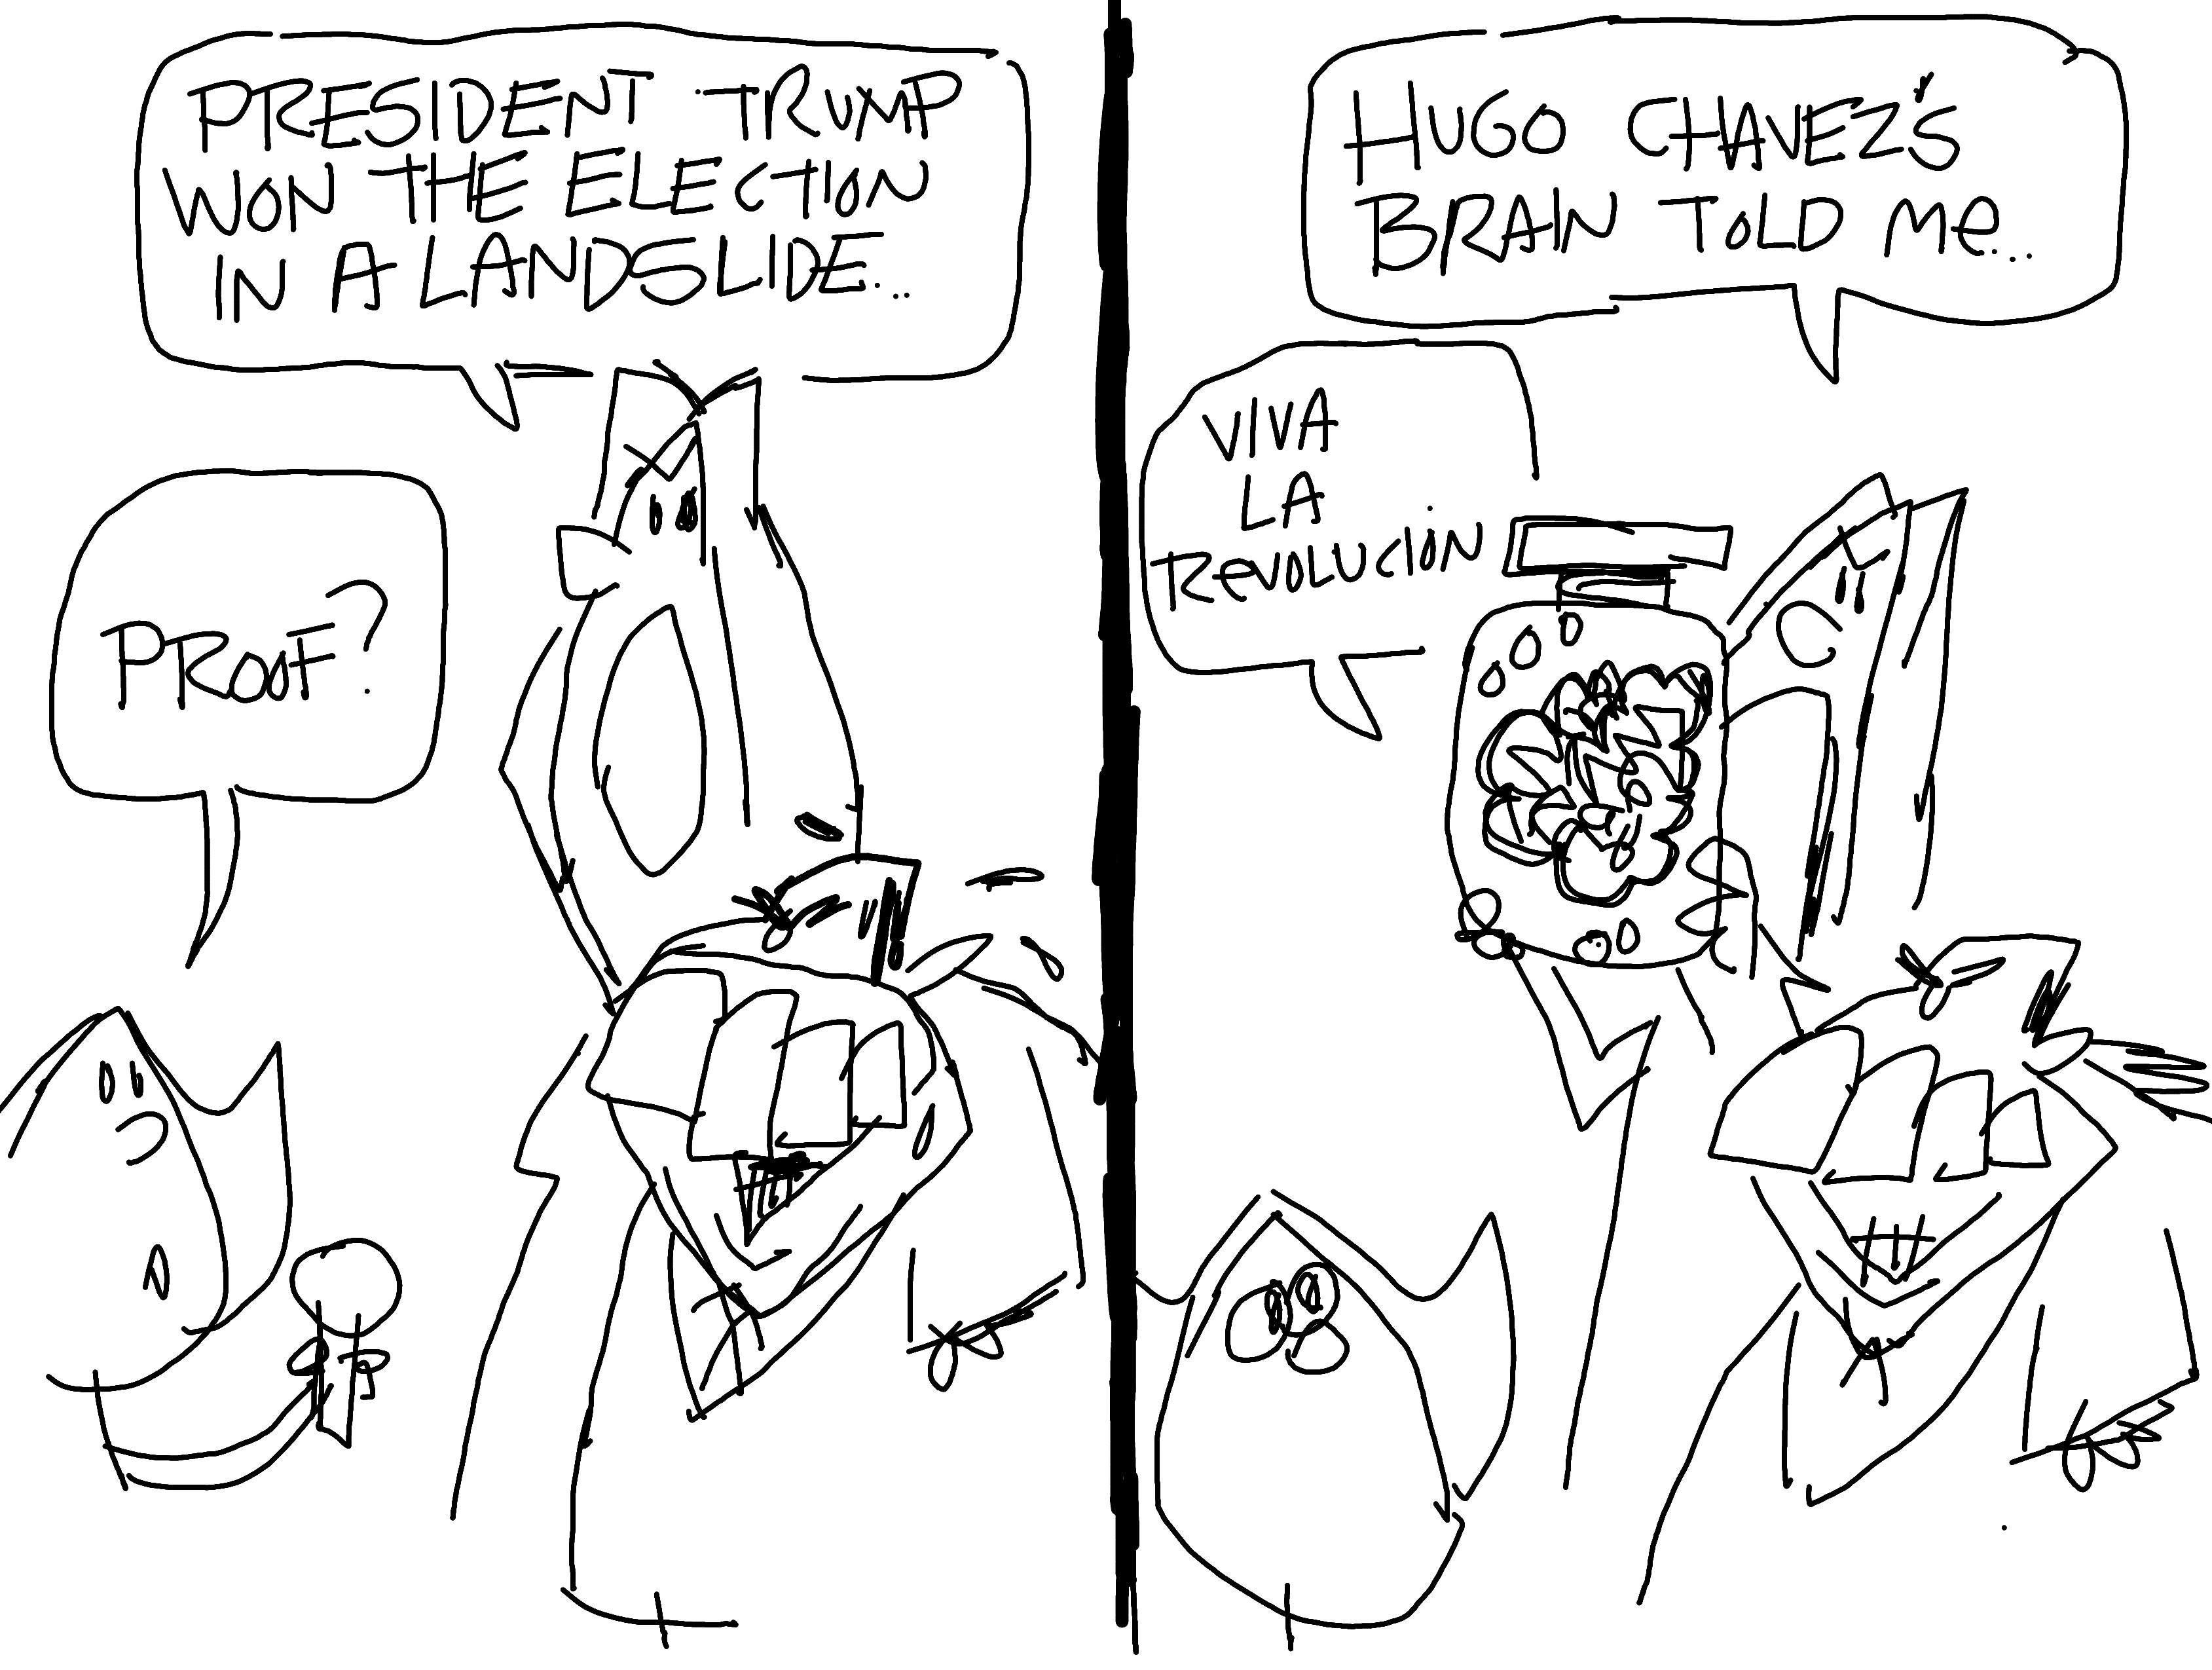 CNNrough0120